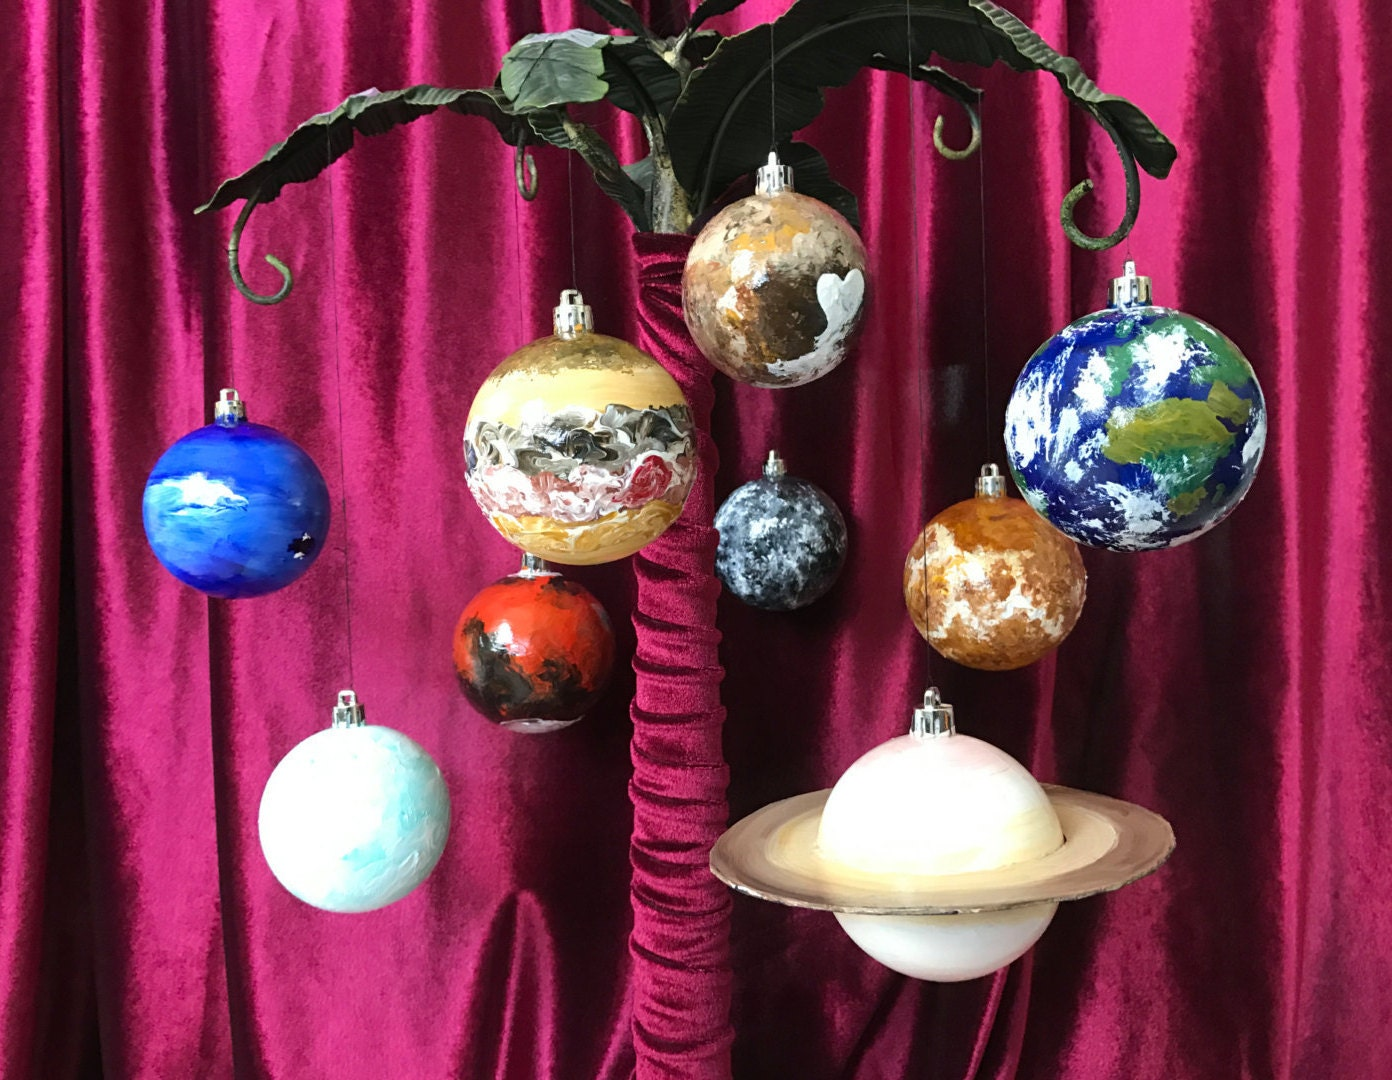 jupiter planet ornament - photo #15